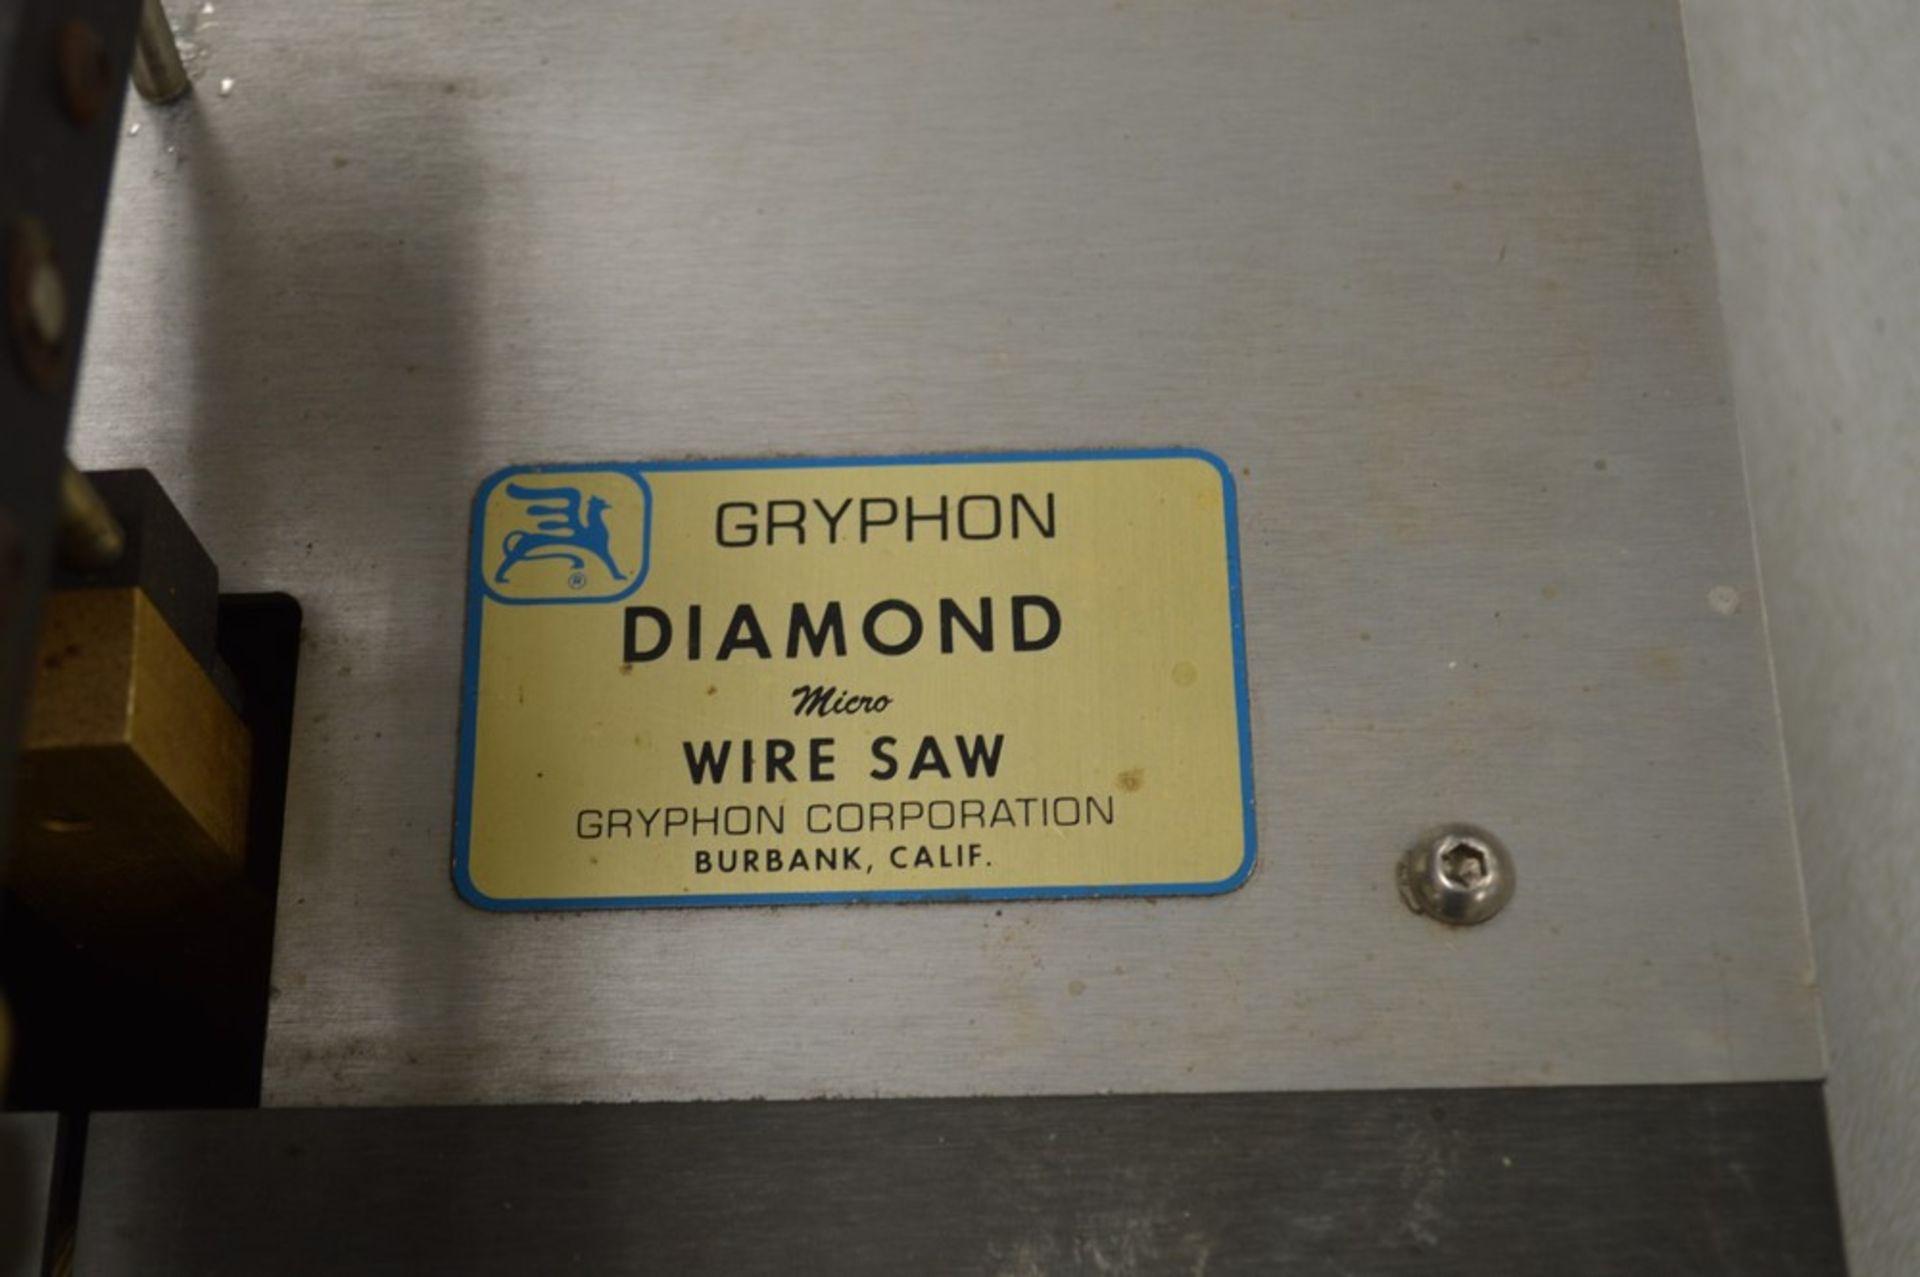 Gryphon Diamond micro wire saw - Image 3 of 4